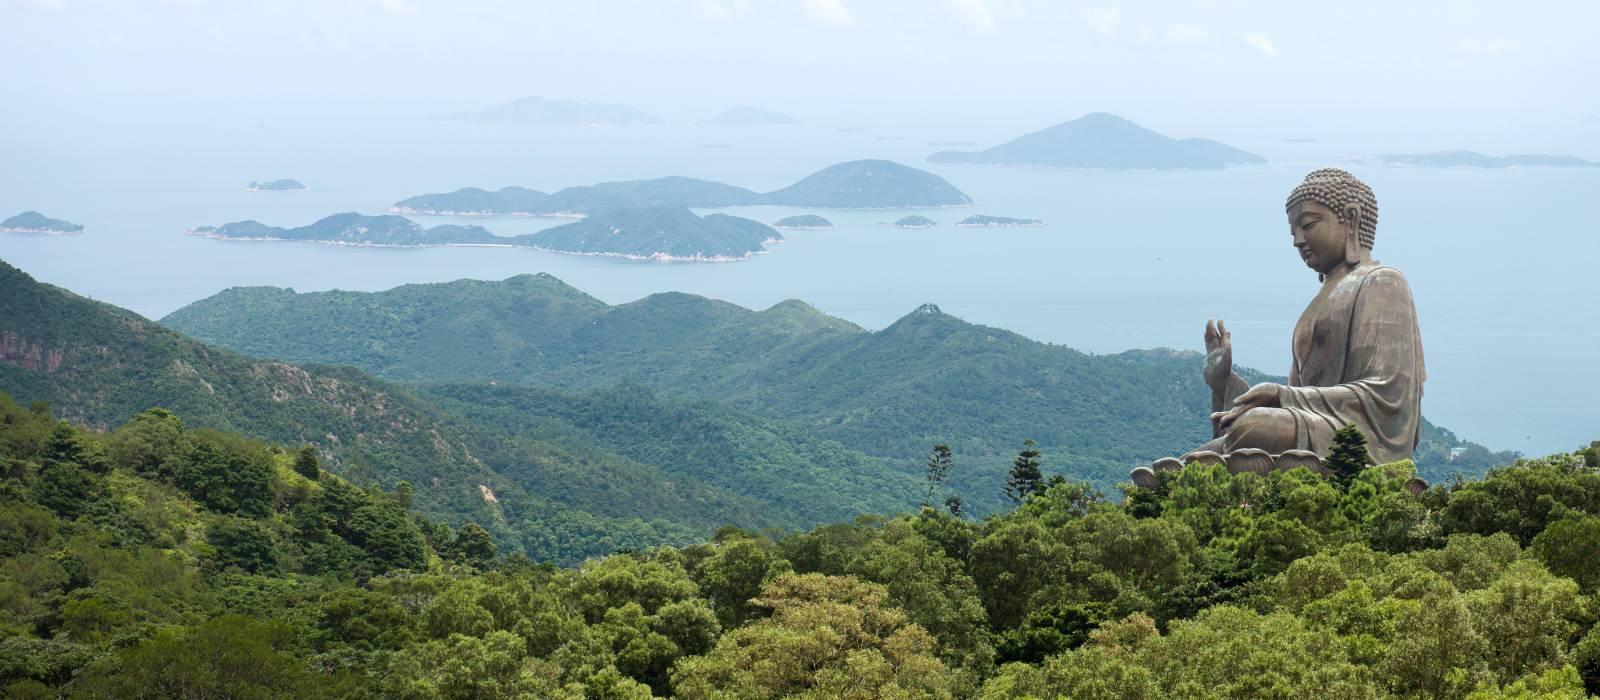 Hongkong,Po Lin Klosters mit blauem Himmel, Asien